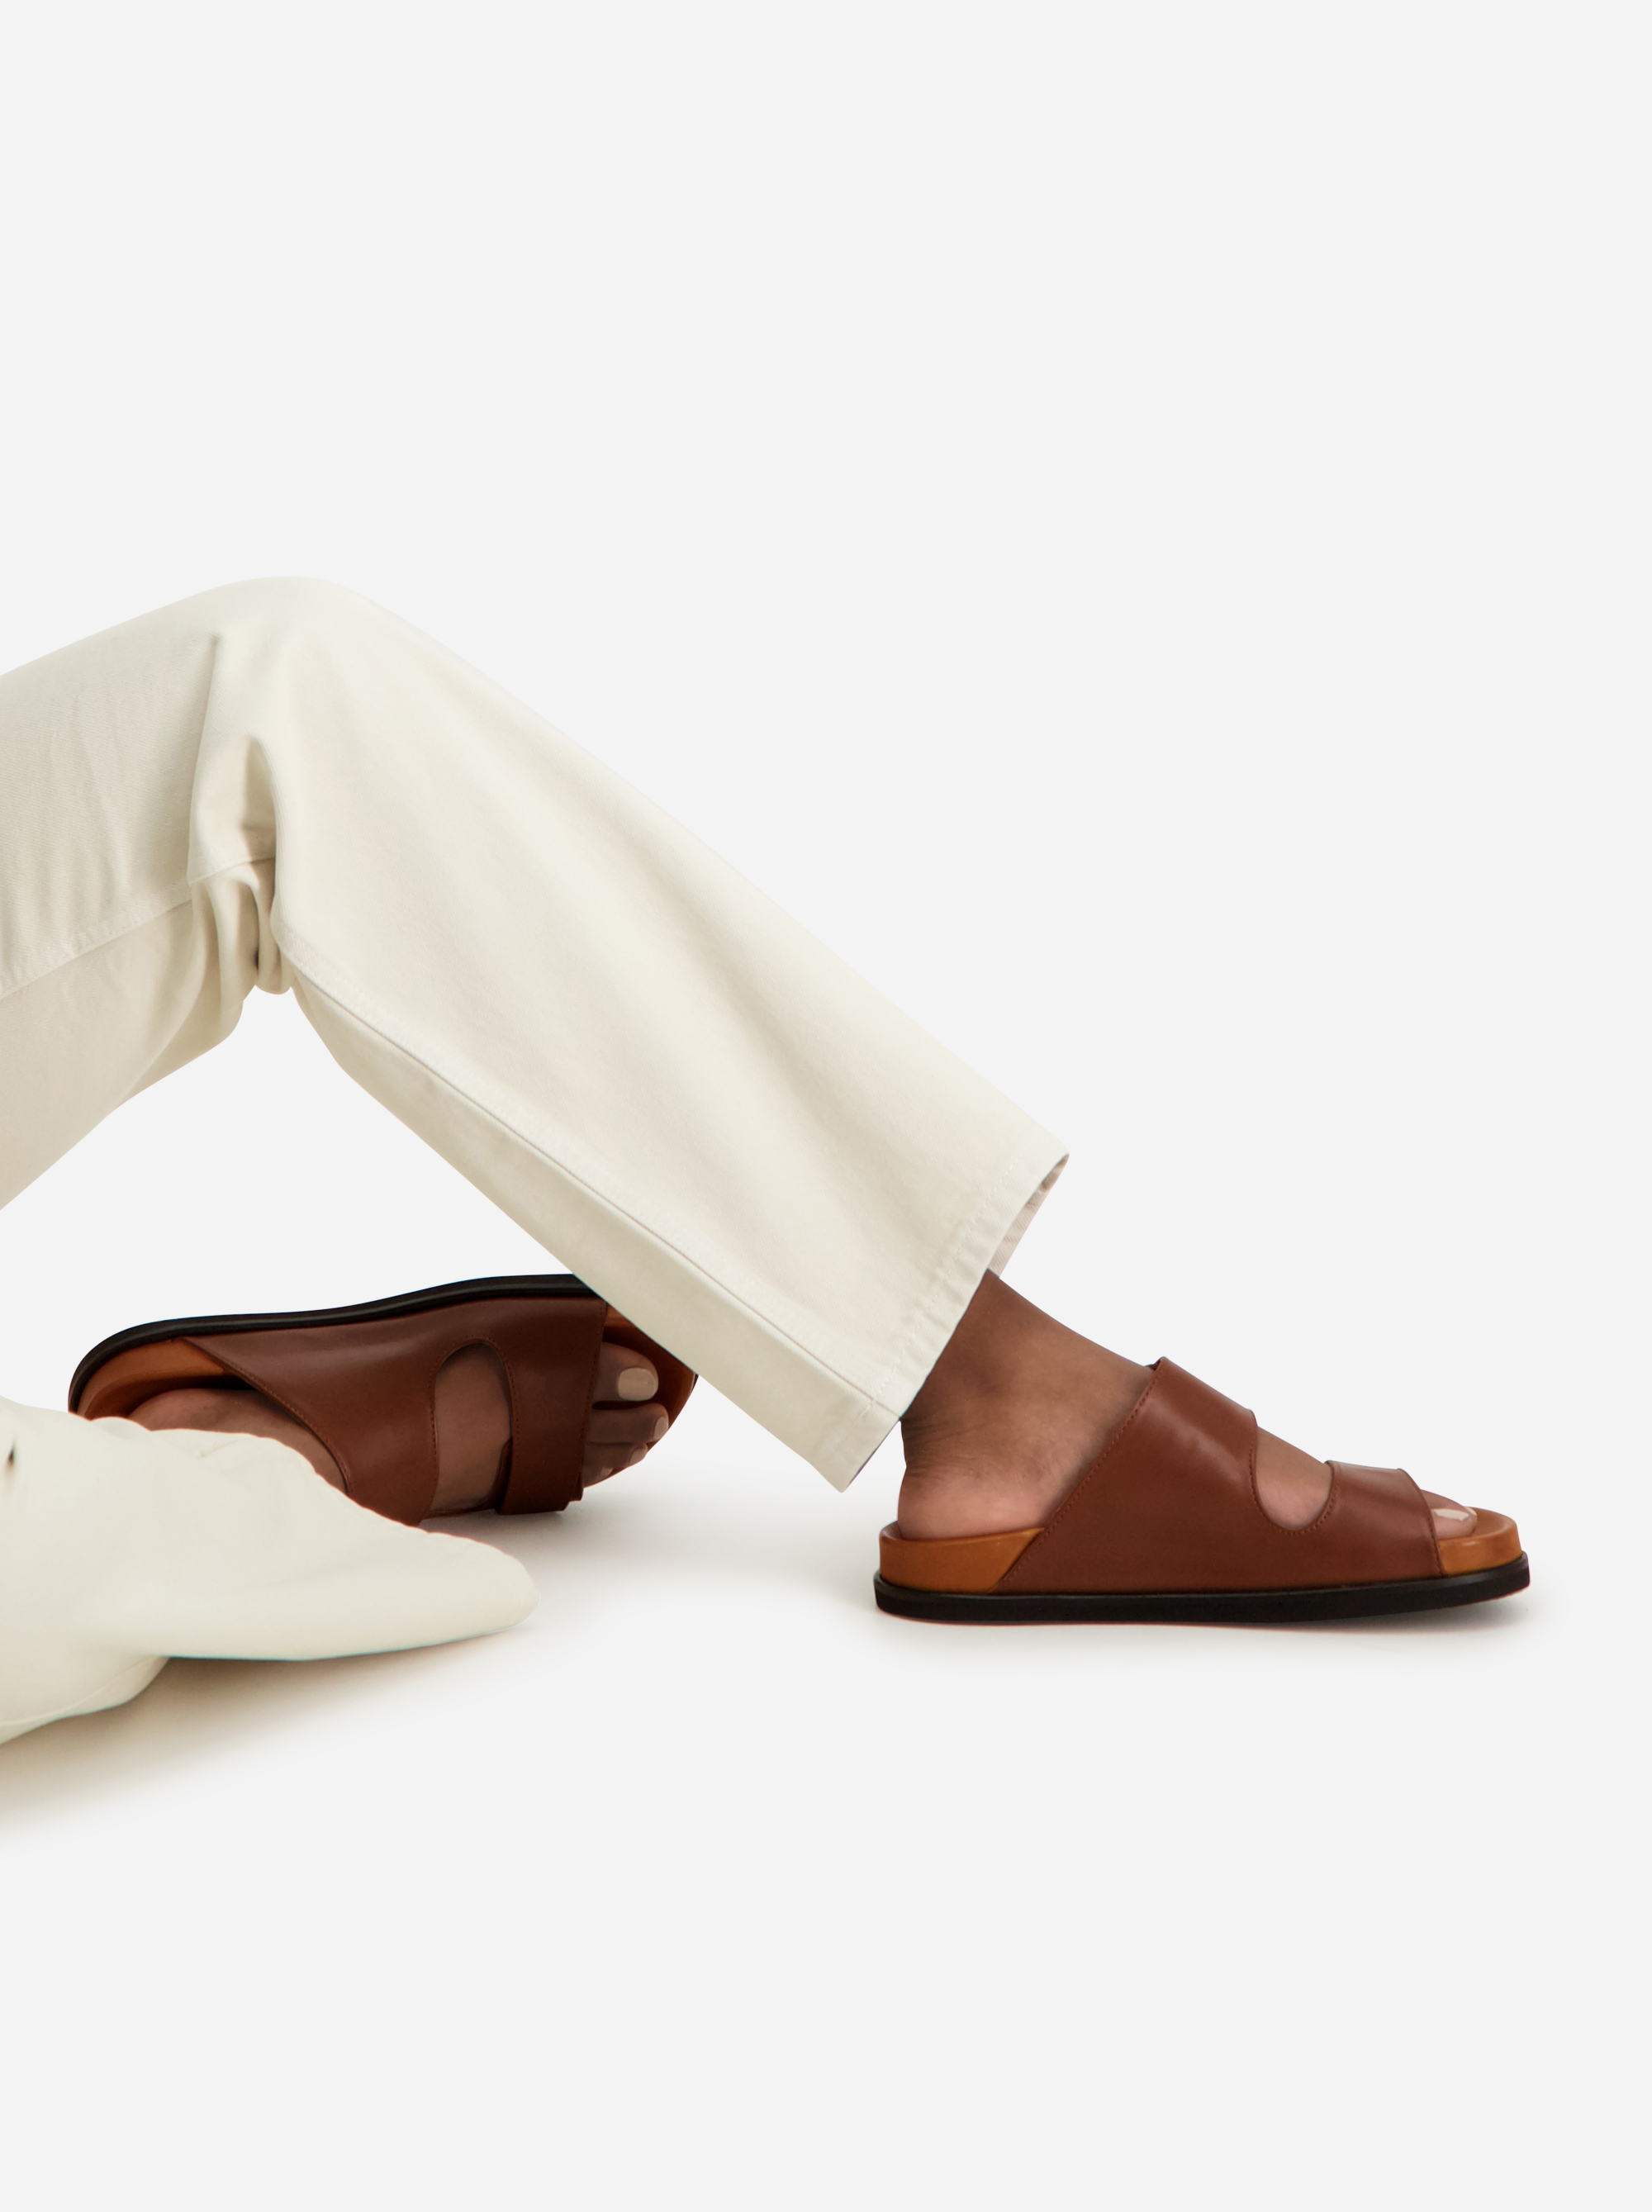 Teym - The Sandal - Women - Brown - 1